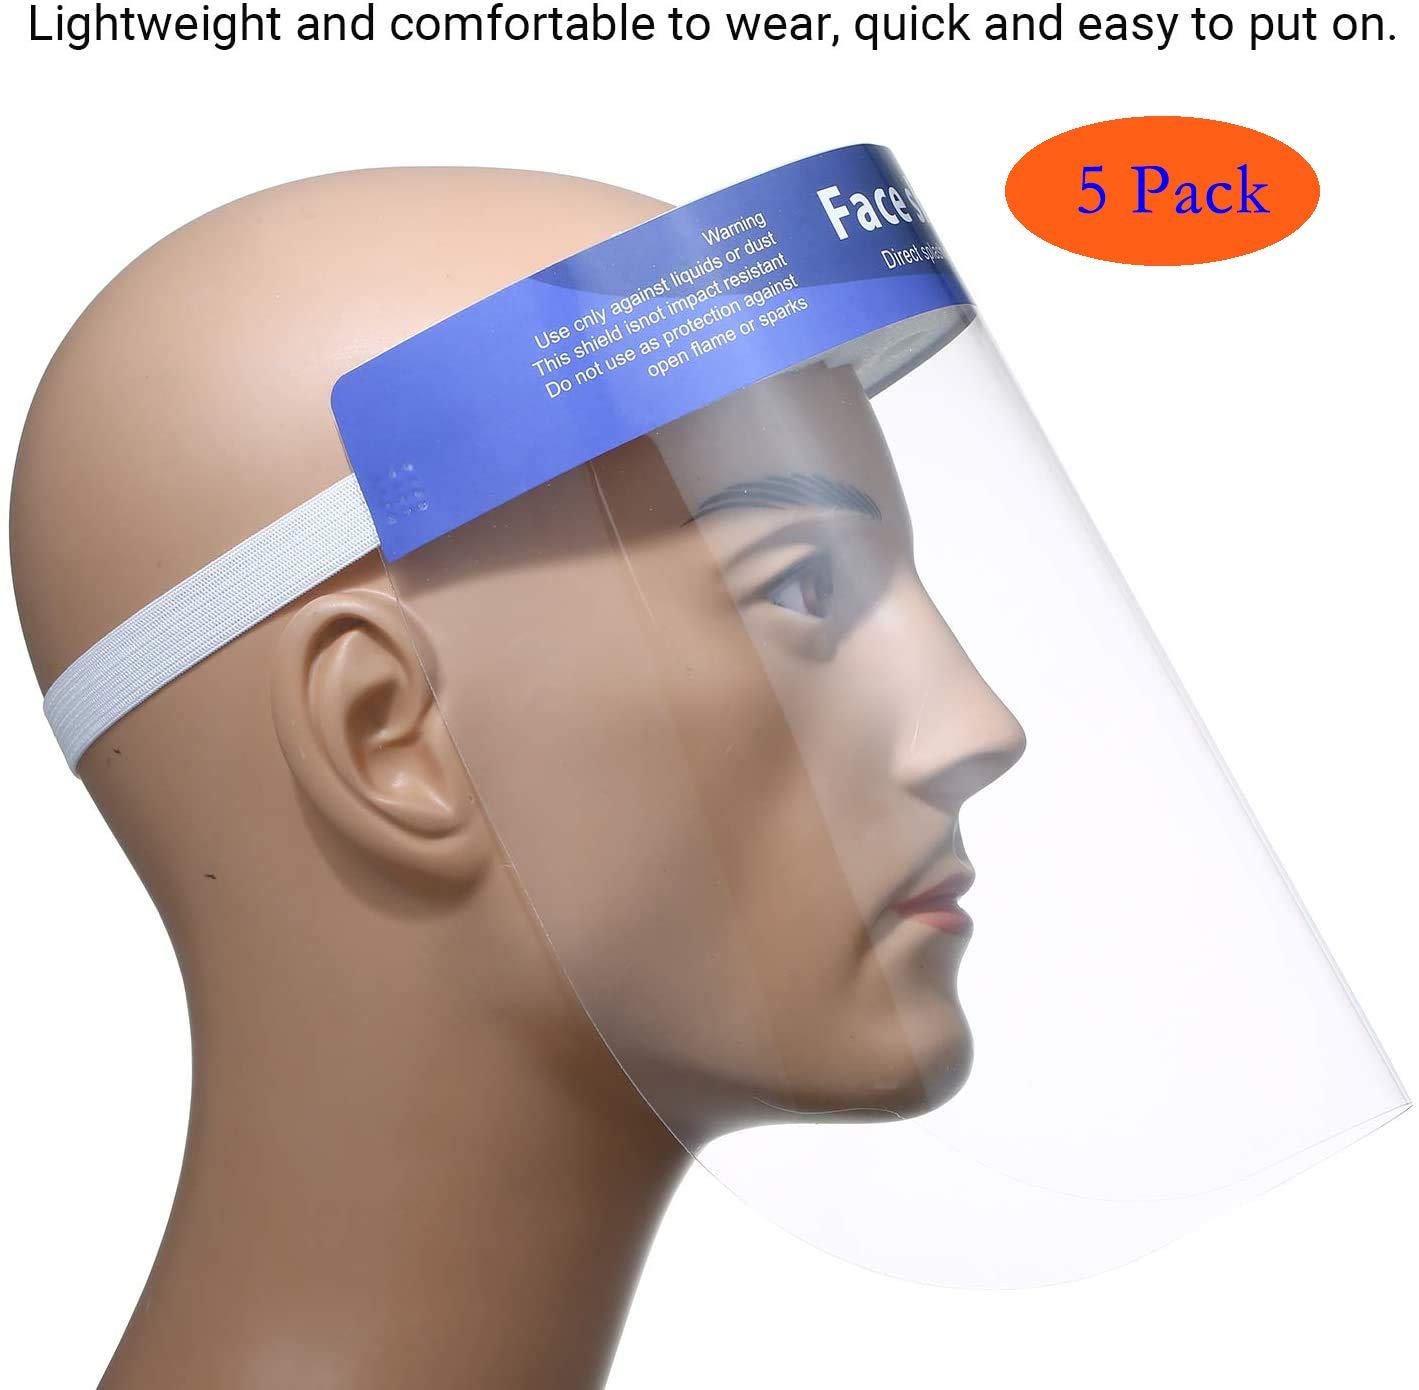 Pyjacos 5Pcs PET Protectores Faciales de Seguridad Protecci/ón m/áscara Visera